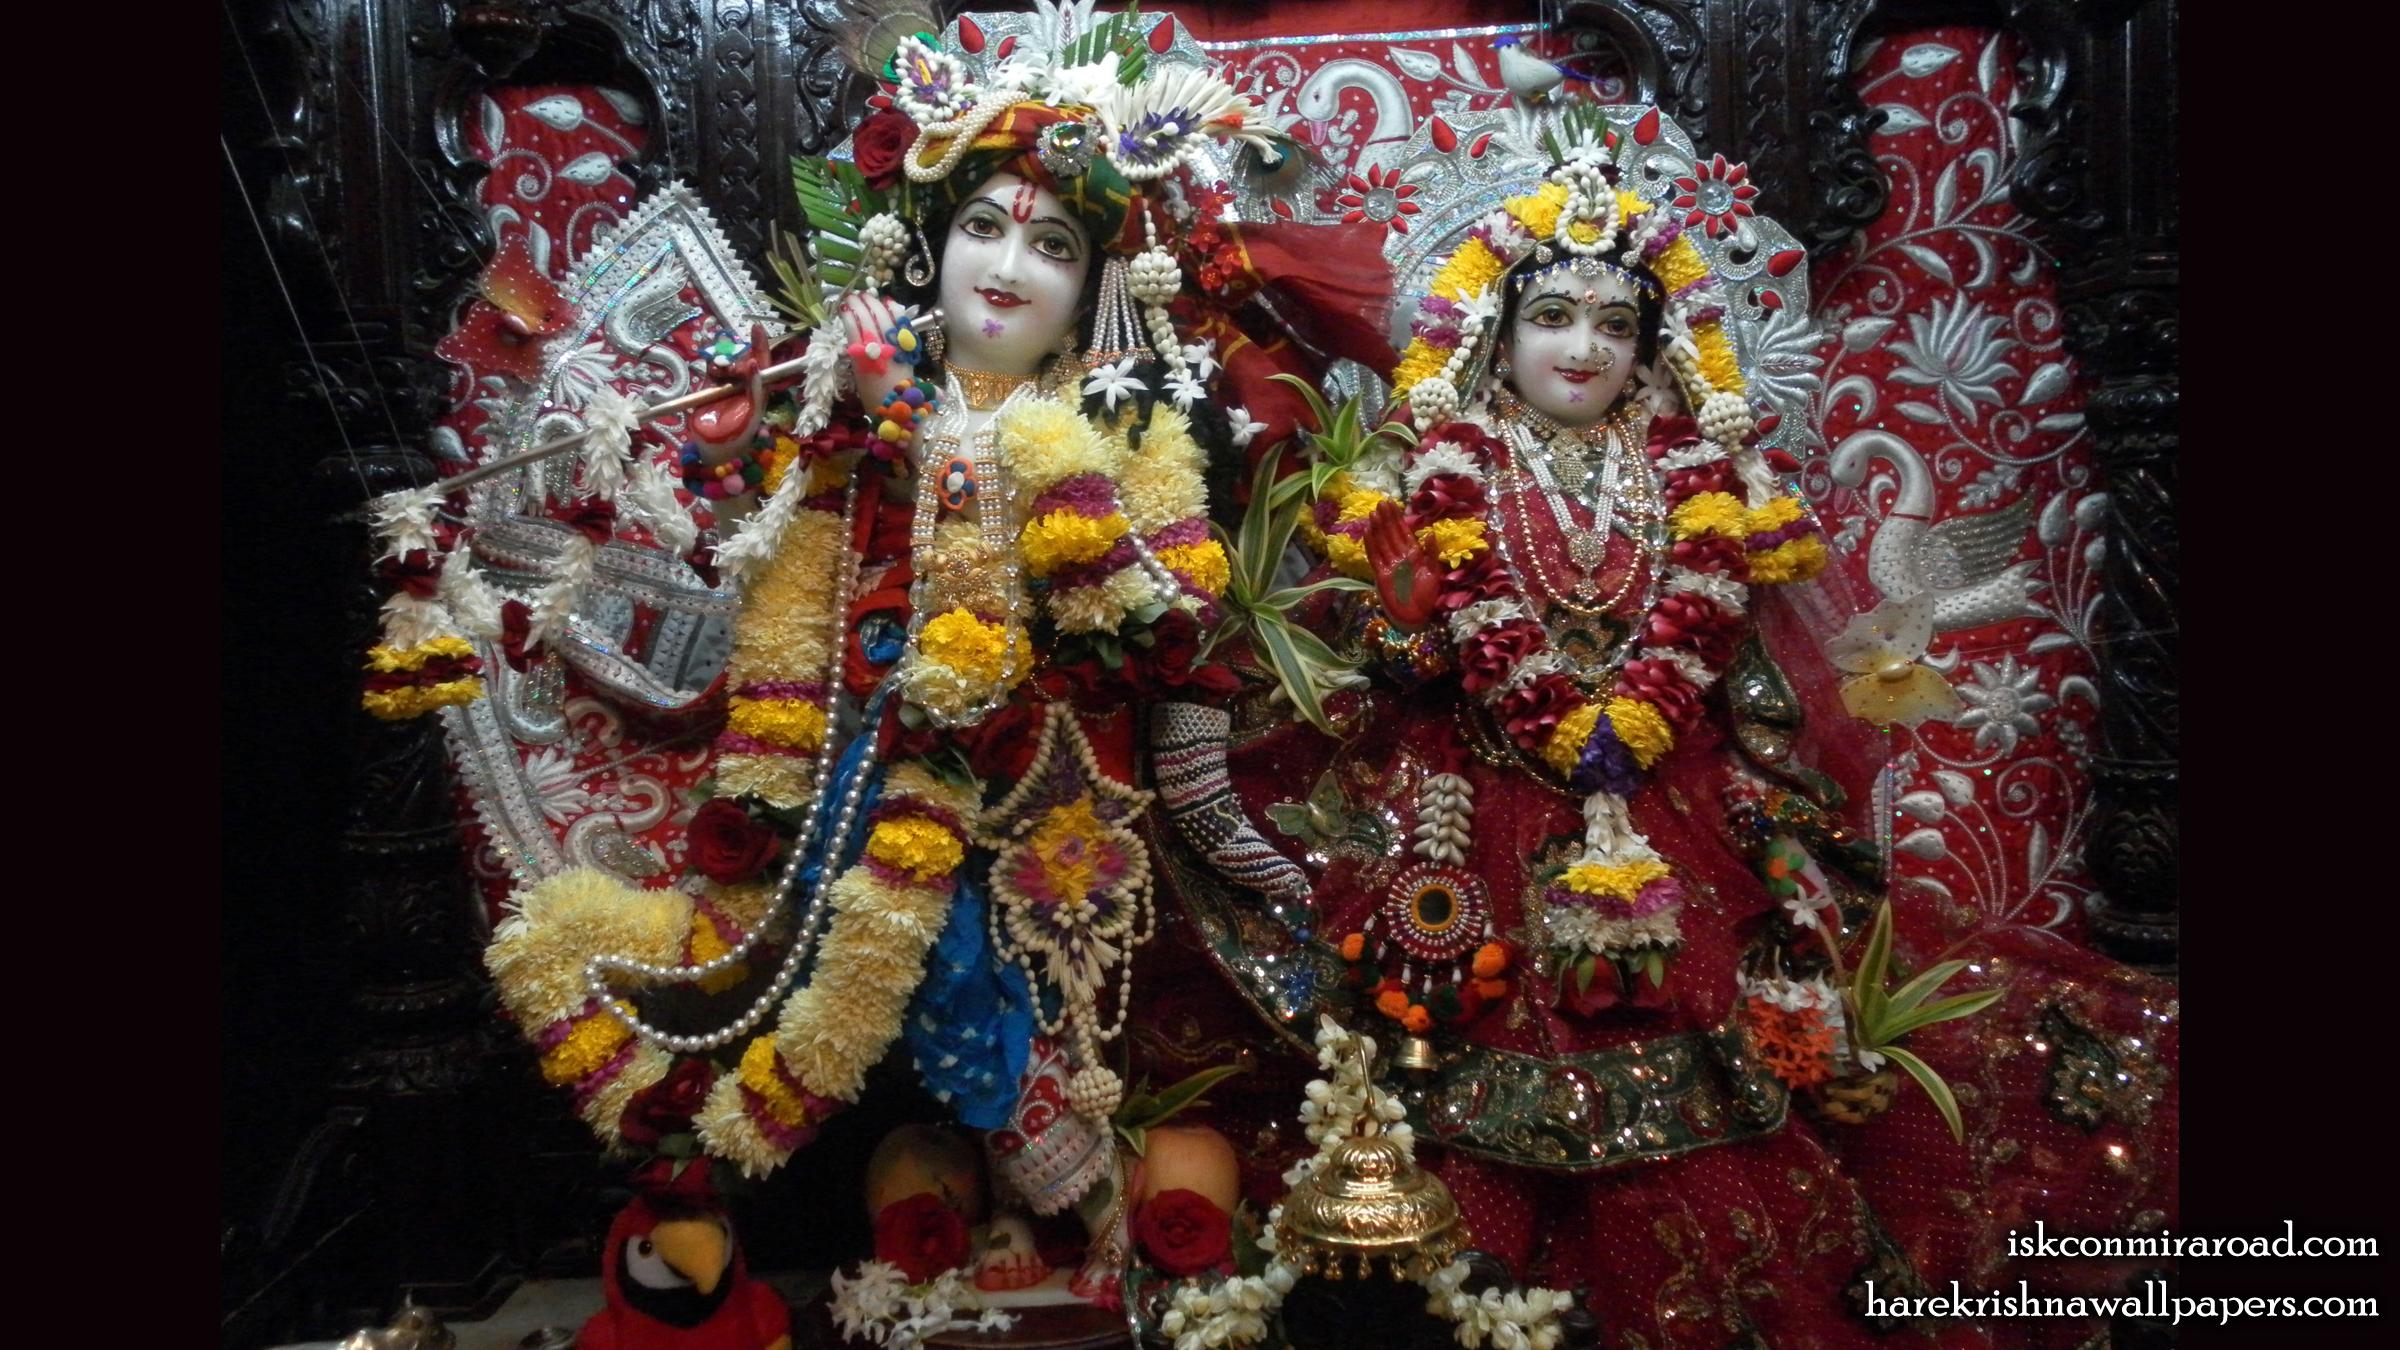 Sri Sri Radha Giridhari Wallpaper (011) Size 2400x1350 Download